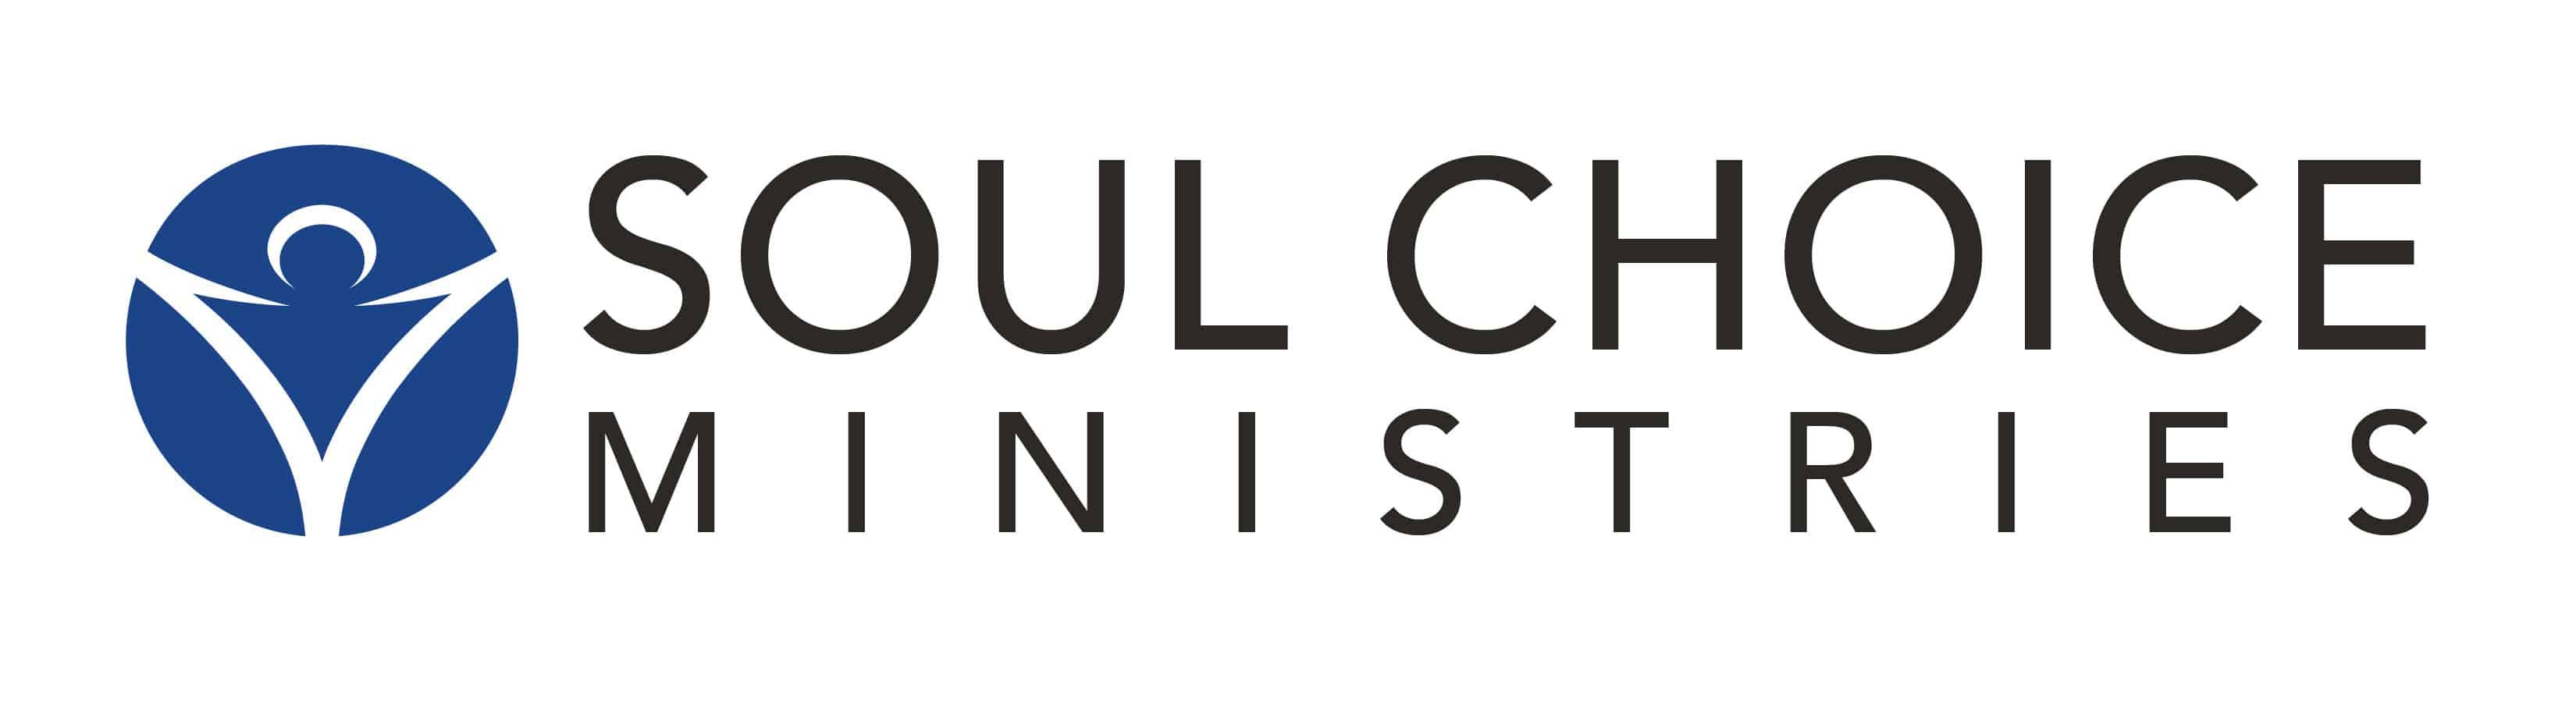 Soul Choice Ministries